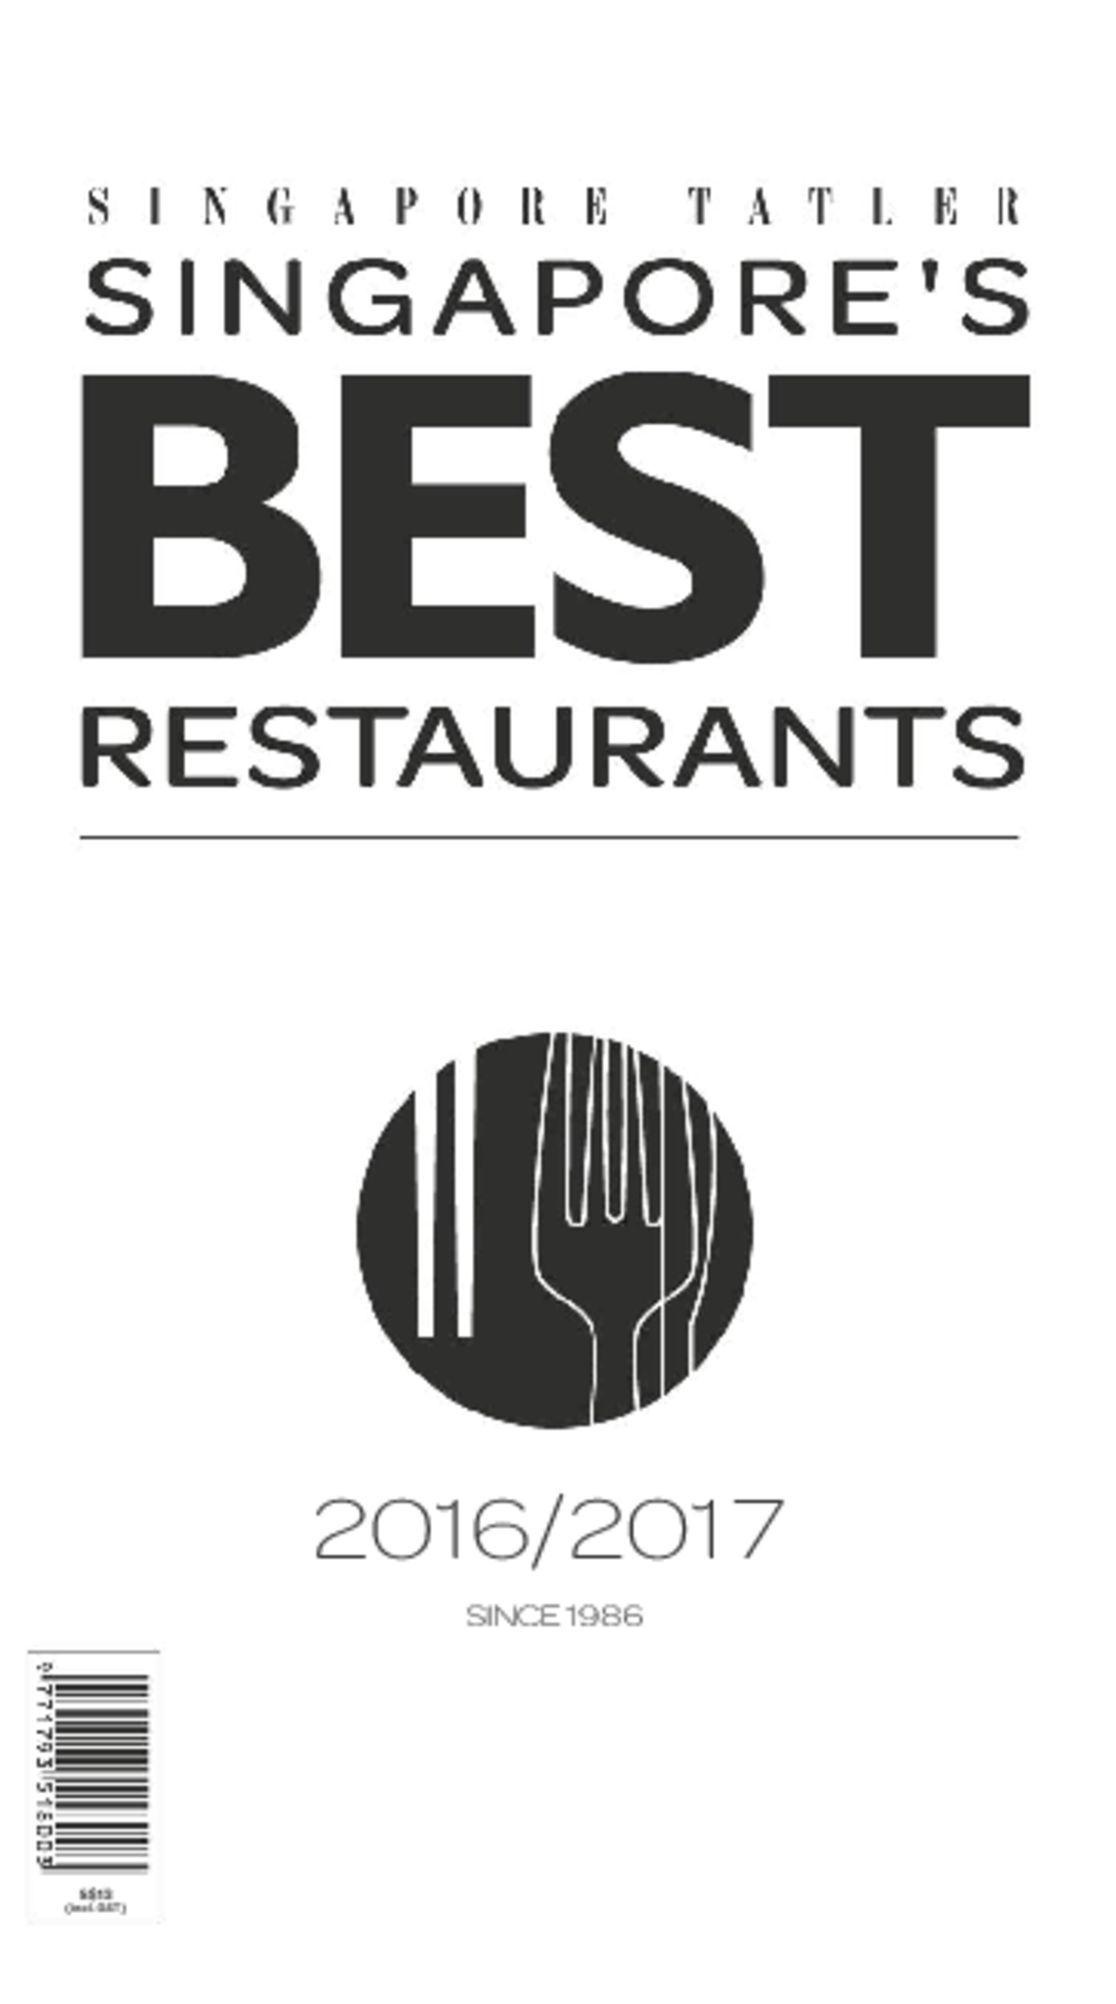 Singapore Tatler Singapore's Best Restaurants Magazine